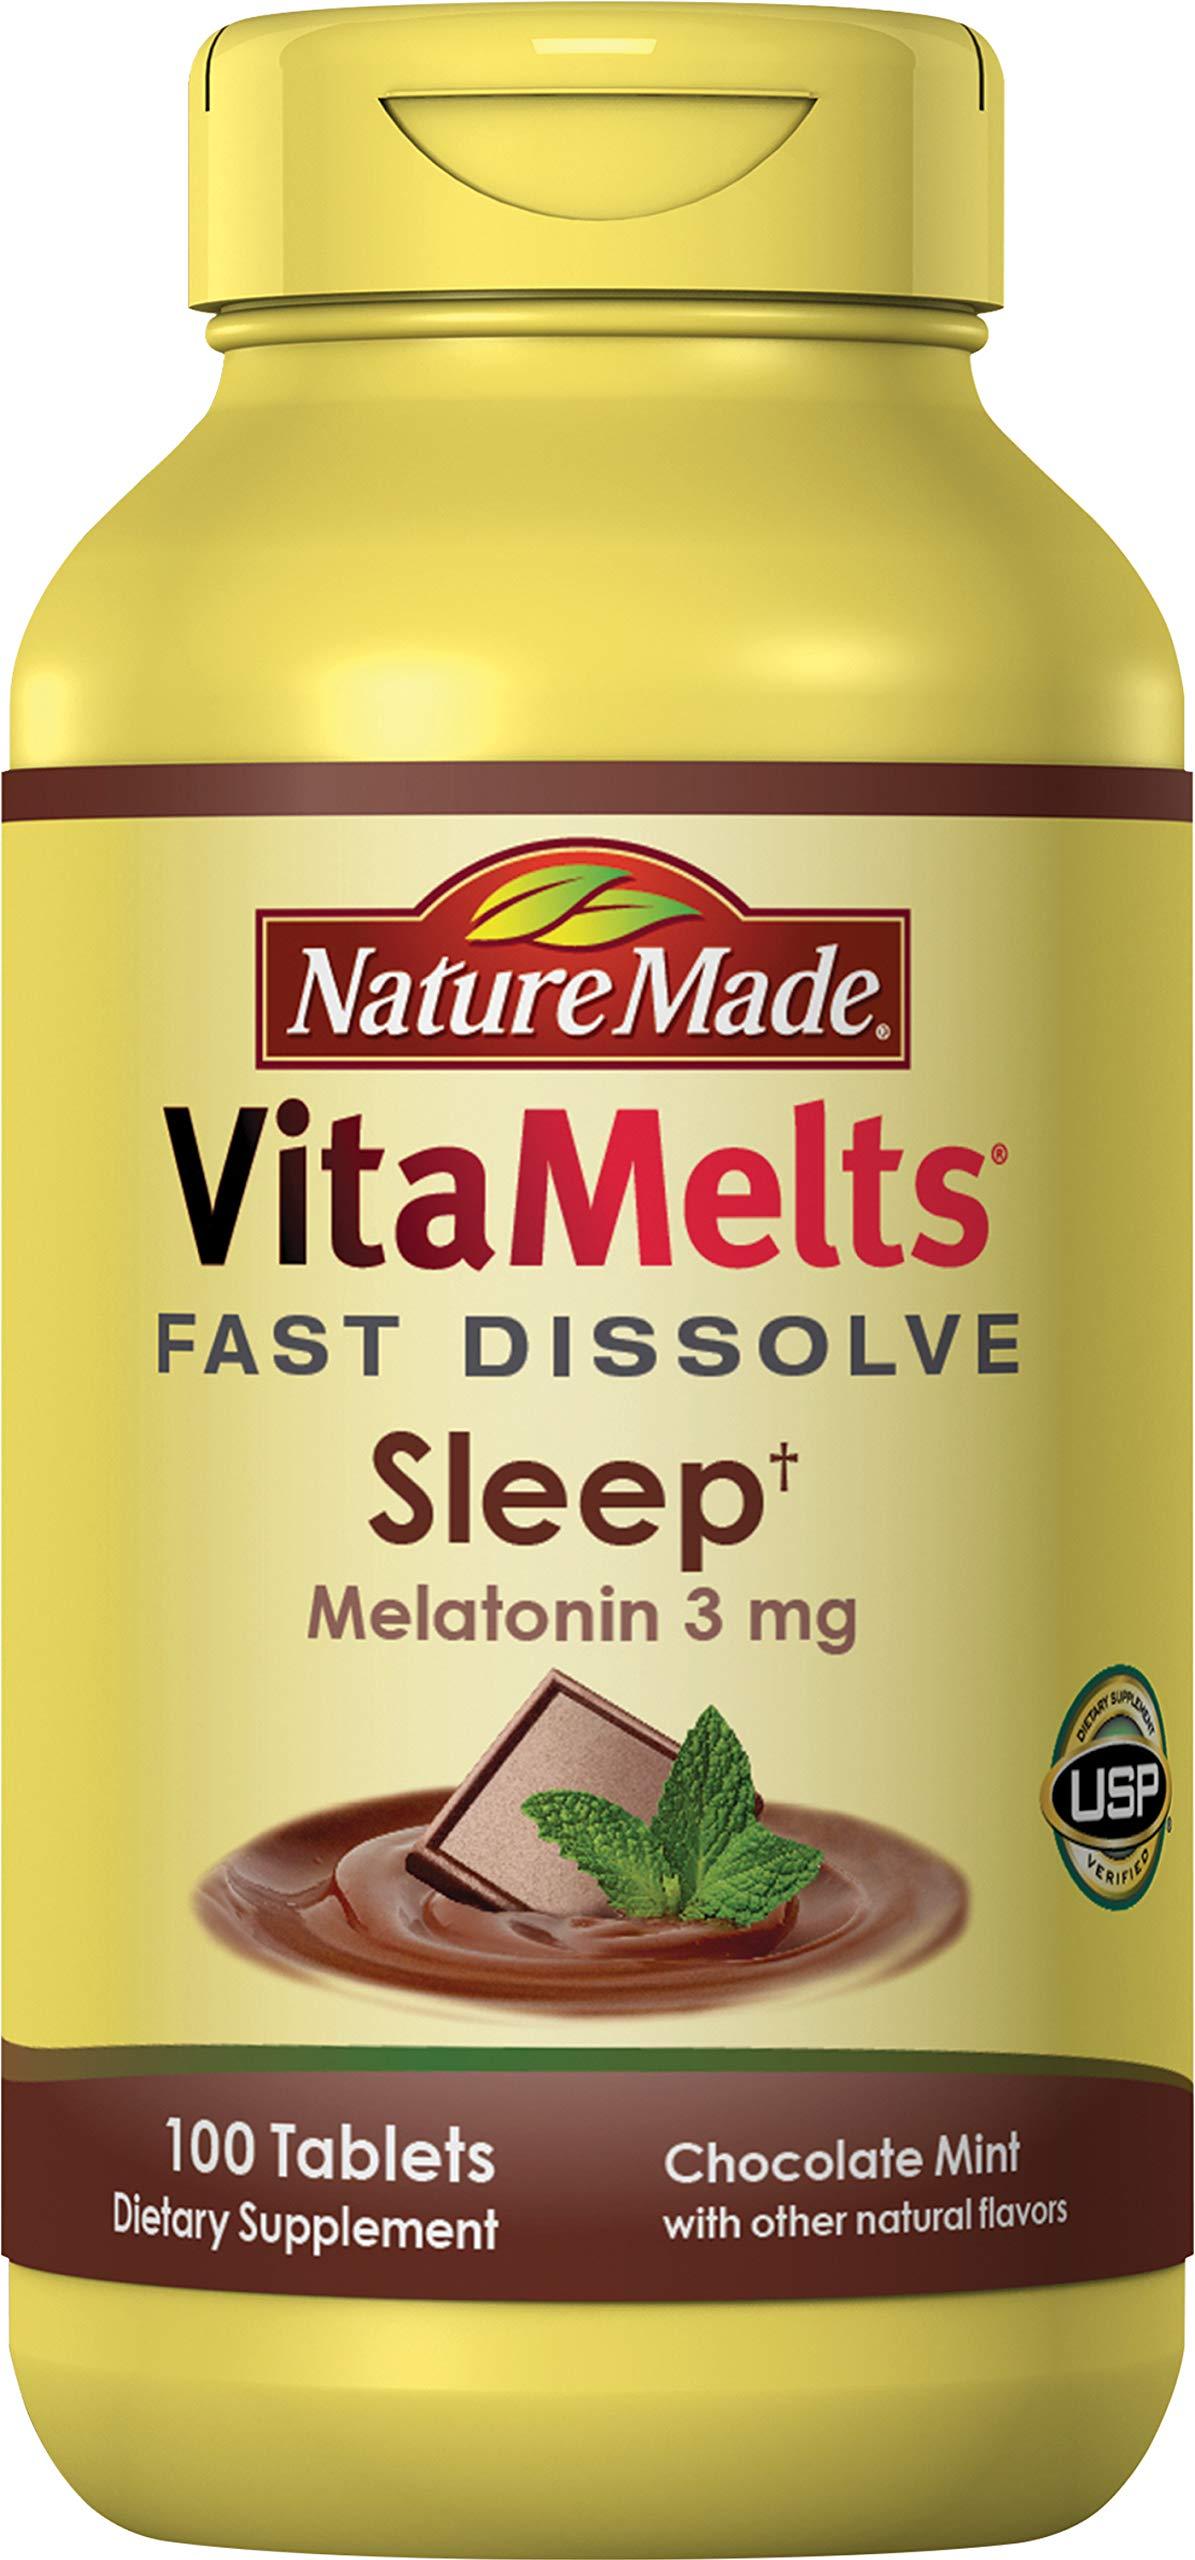 Nature Made VitaMelts Fast Dissolve Melatonin 3 mg. (Sleep) 100ct by Nature Made